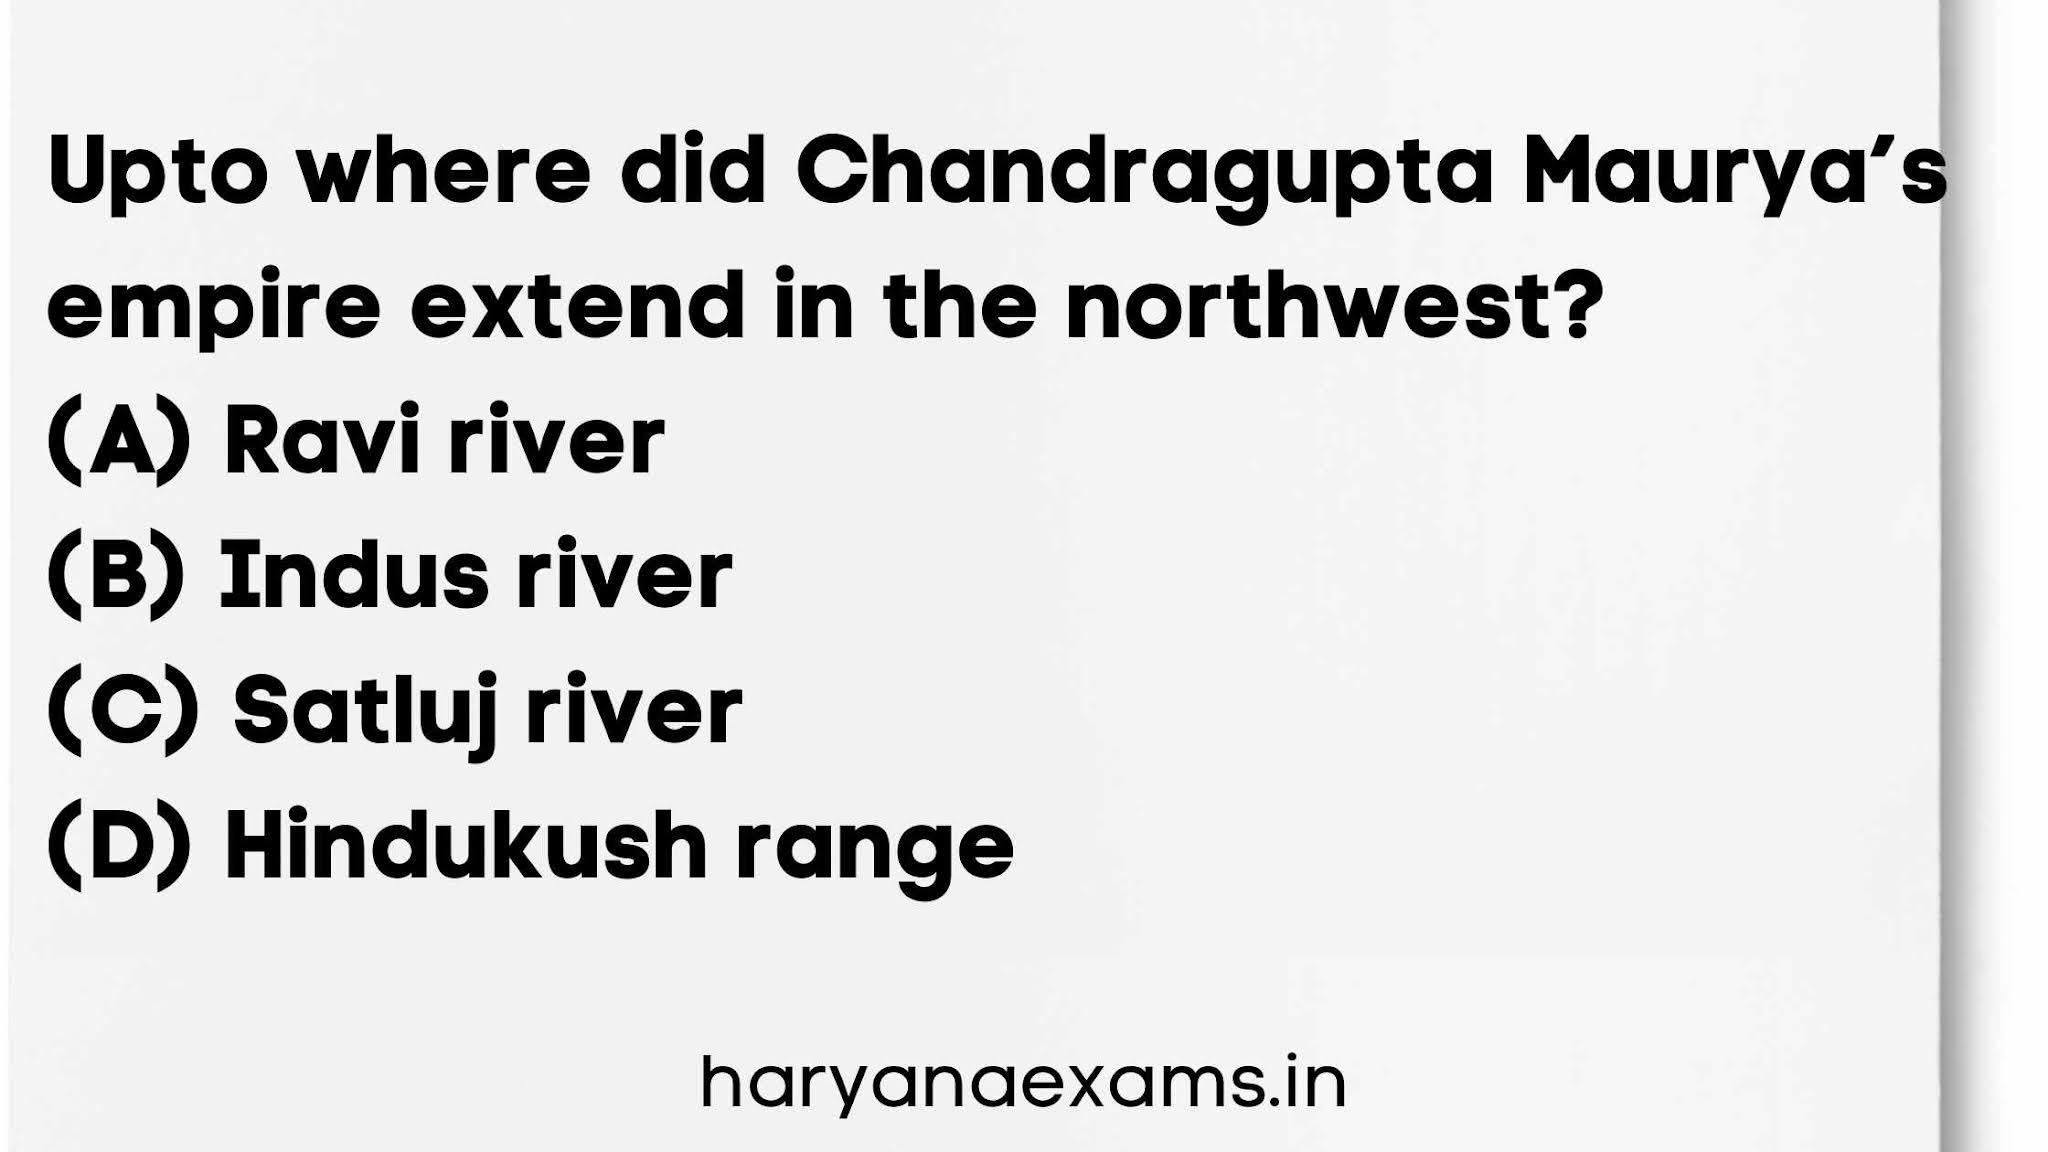 Upto where did Chandragupta Maurya's empire extend in the northwest?   (A) Ravi river   (B) Indus river   (C) Satluj river   (D) Hindukush range